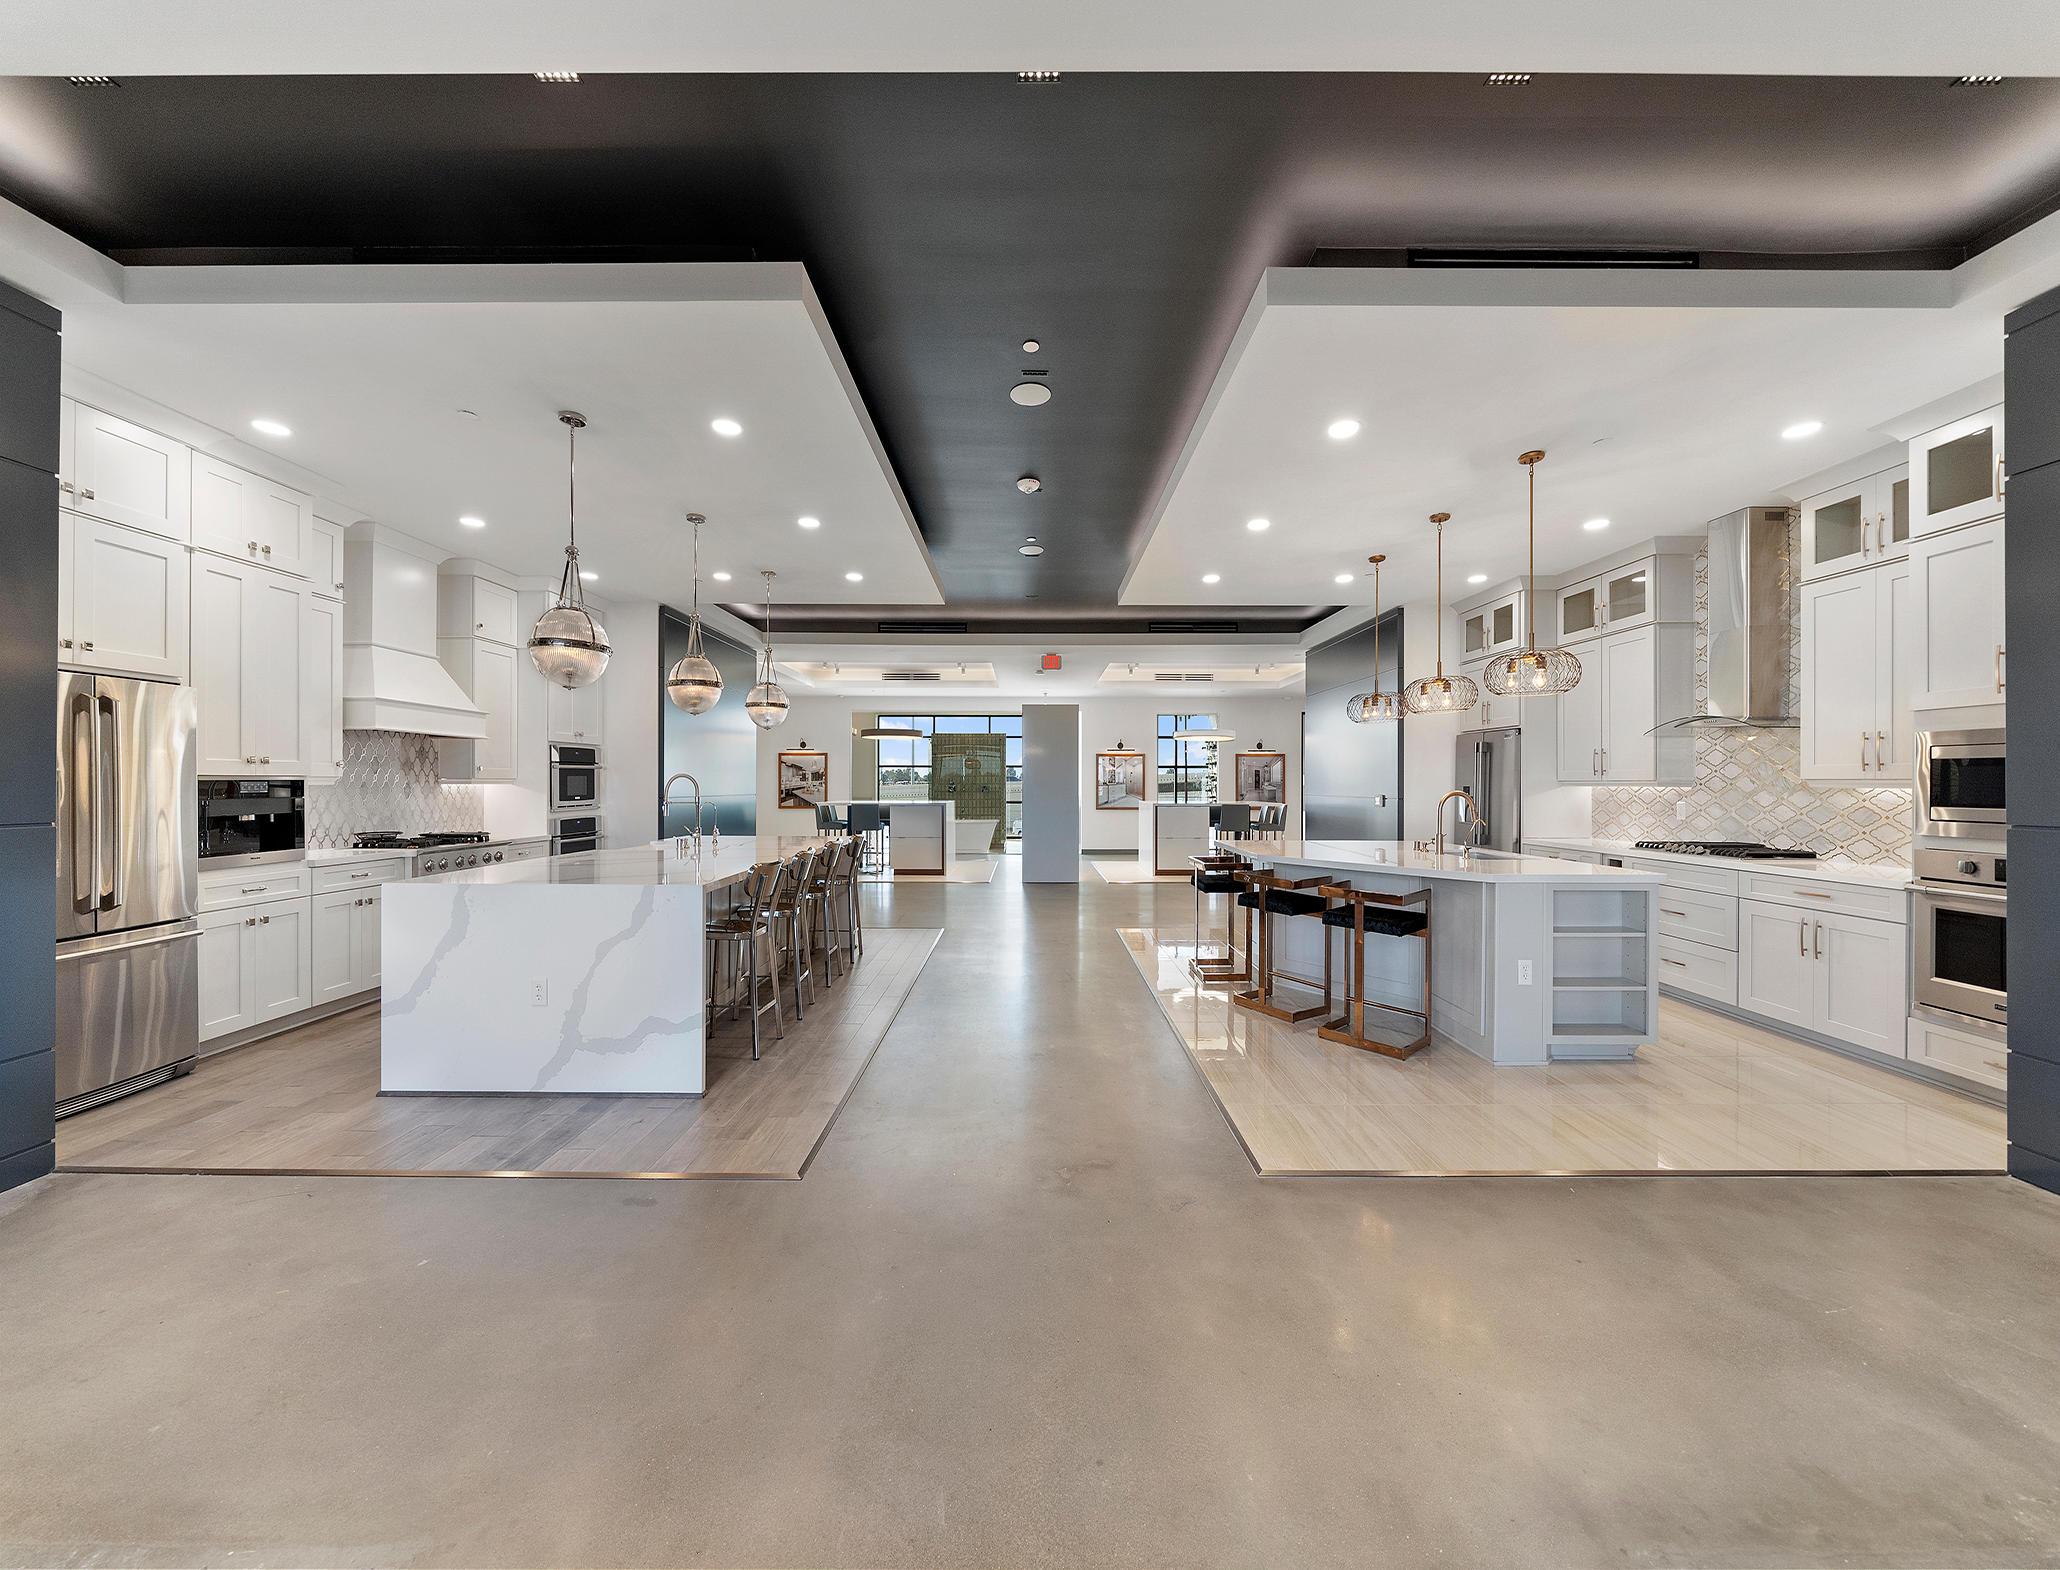 Newmark Homes image 1